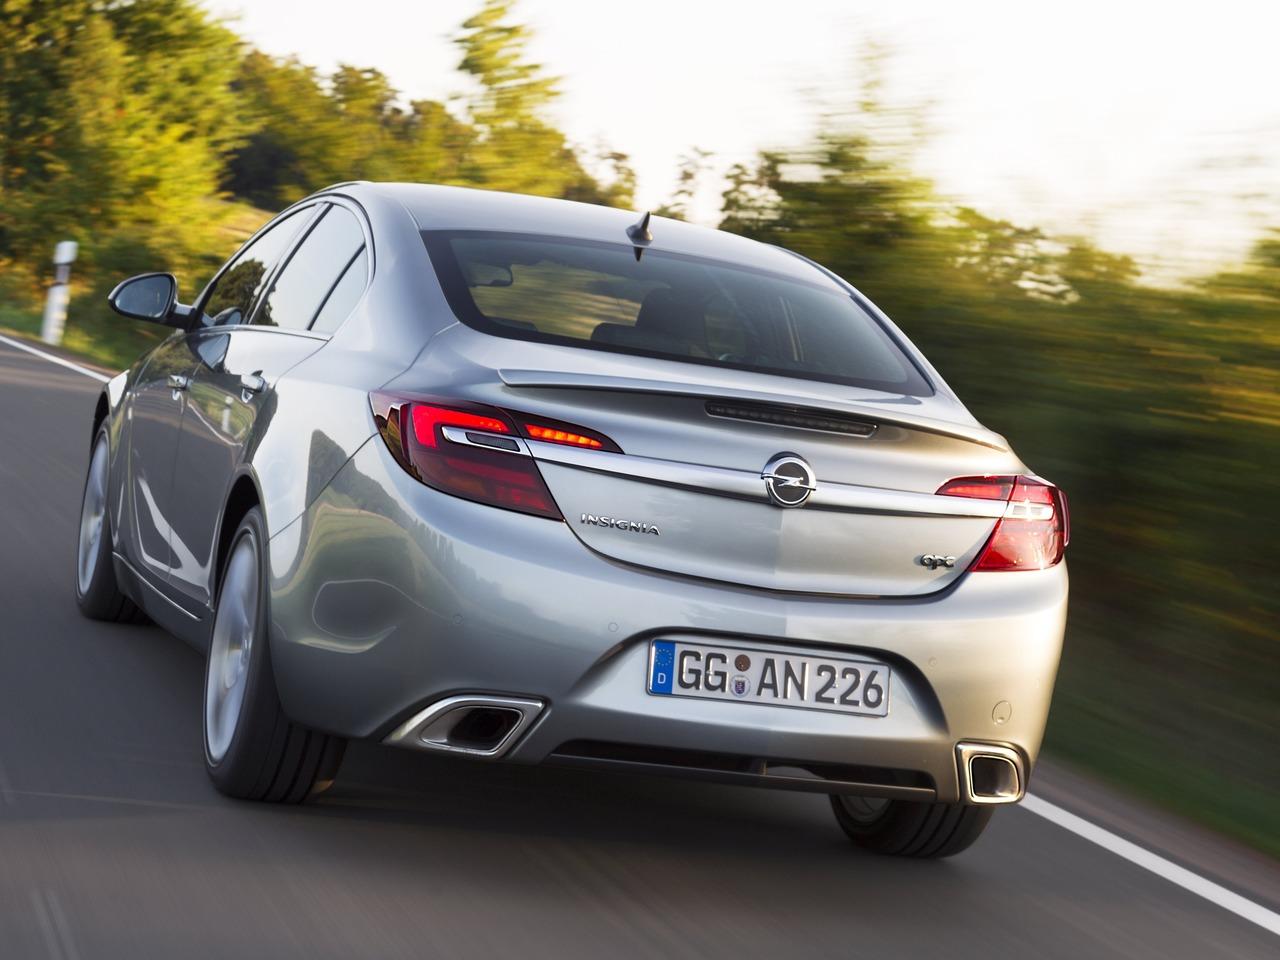 Снимки: Opel Insignia OPC